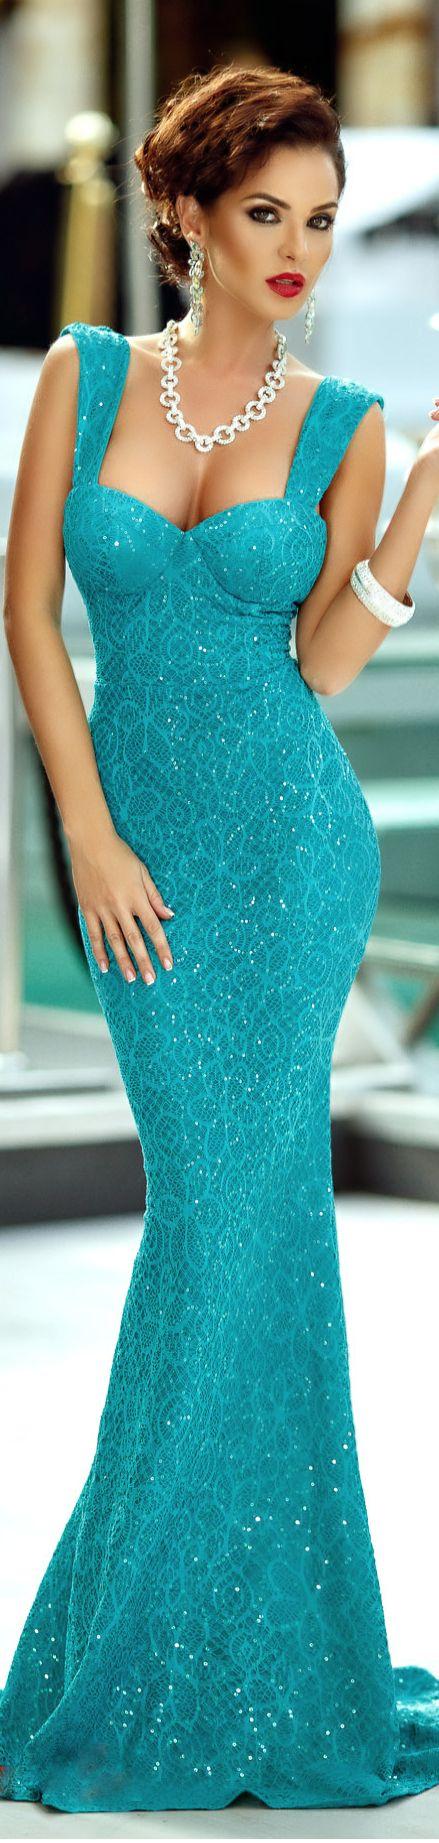 Turquesa vesridos pinterest turquoise prom and uk prom dresses